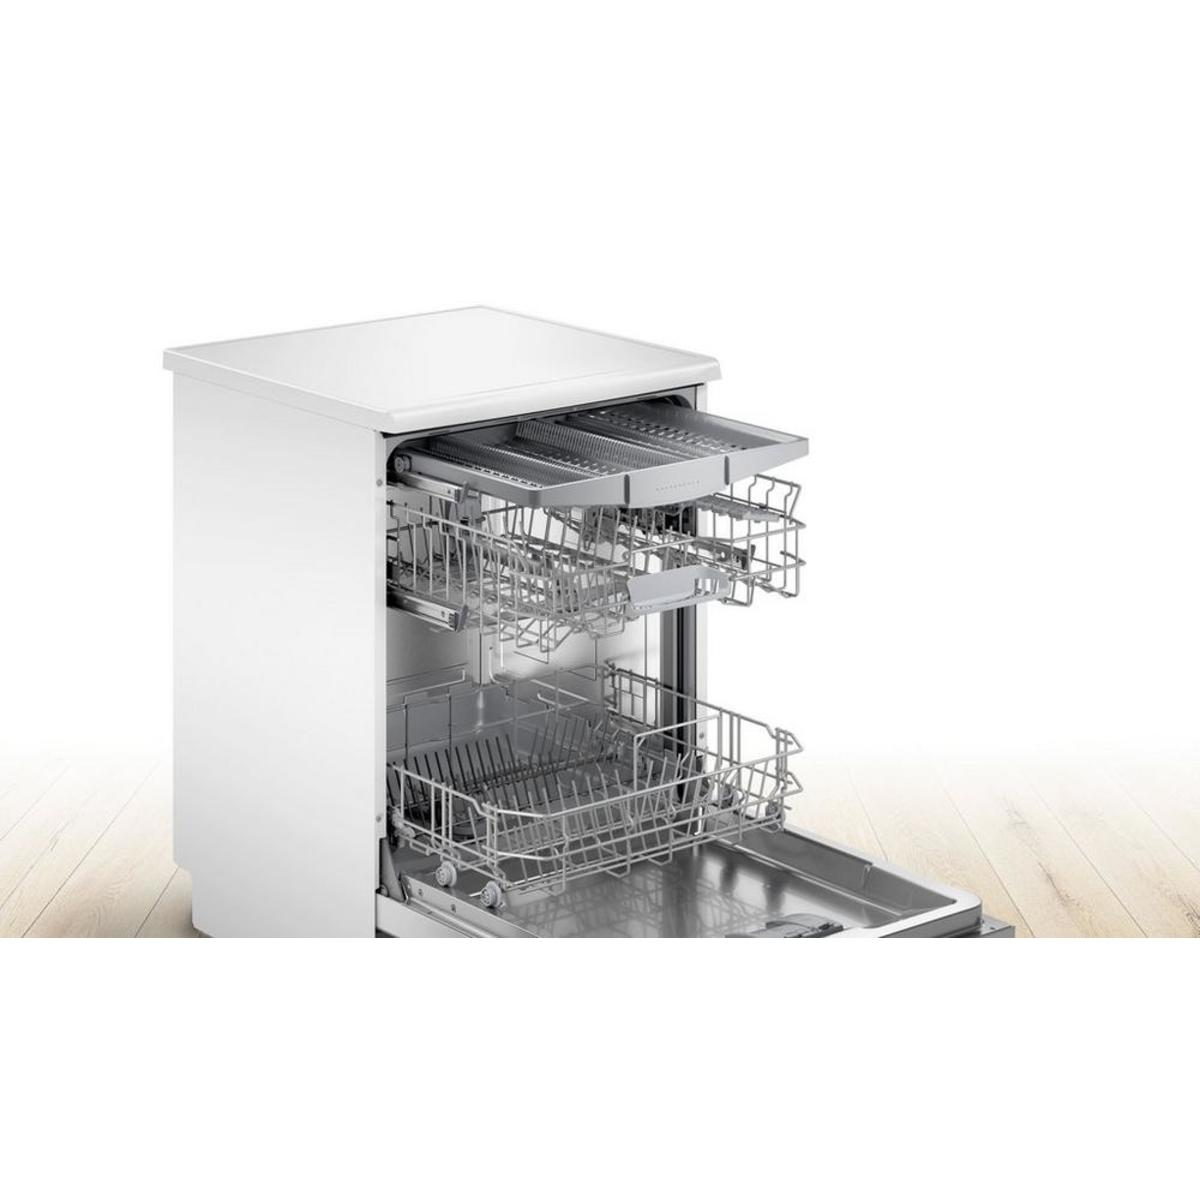 Image of Bosch SMS2HVW66G Serie 2 60cm Free-standing Dishwasher, White